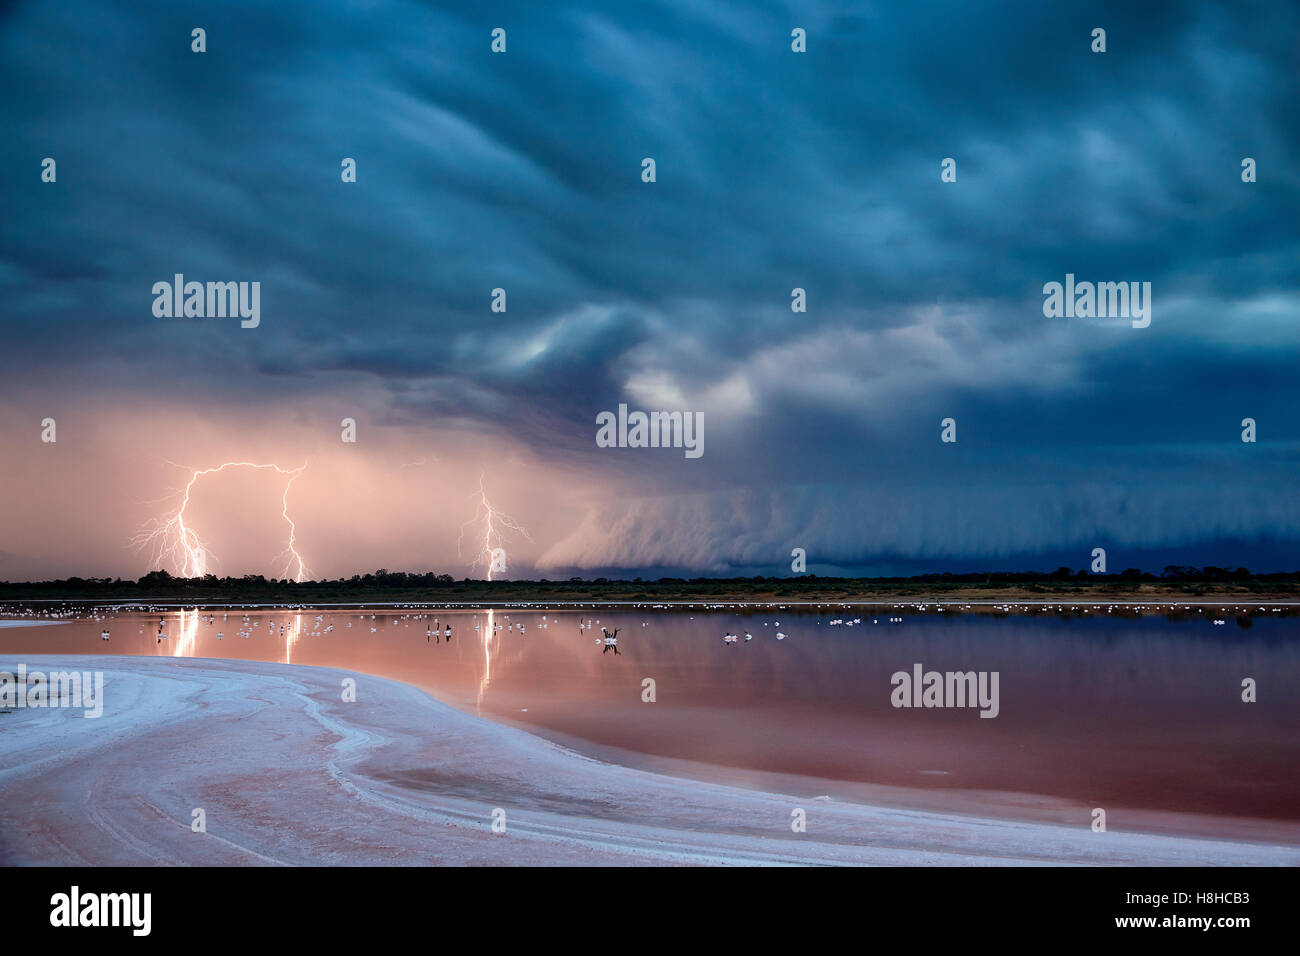 Violent electrical storm approaches Mildura, Victoria, Australia. - Stock Image